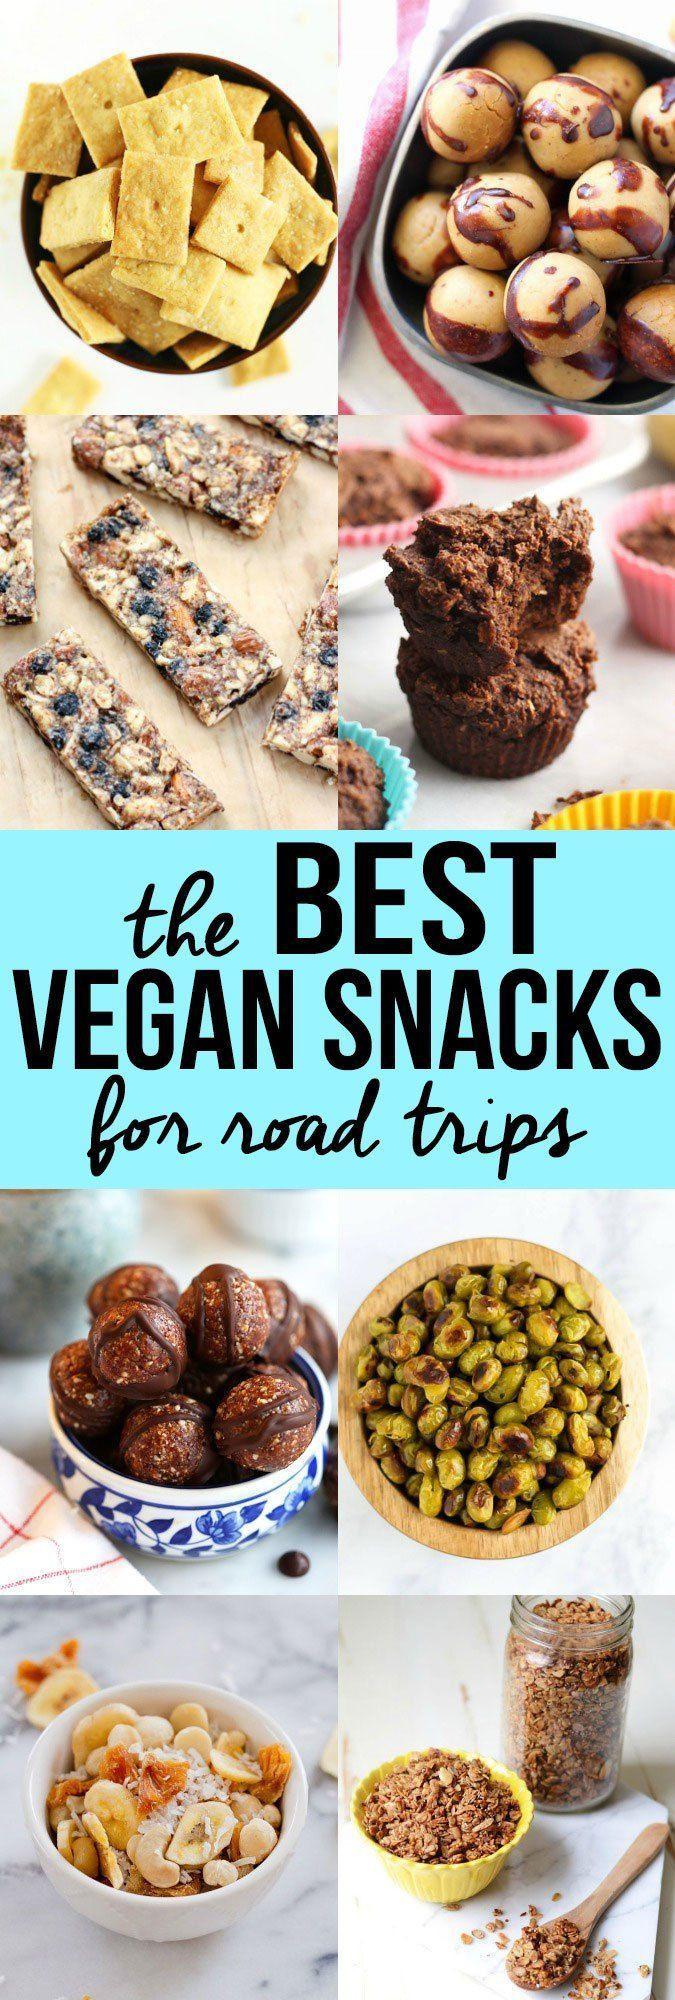 Healthy Vegan Snacks  25 Best Ideas about Vegan Snacks on Pinterest